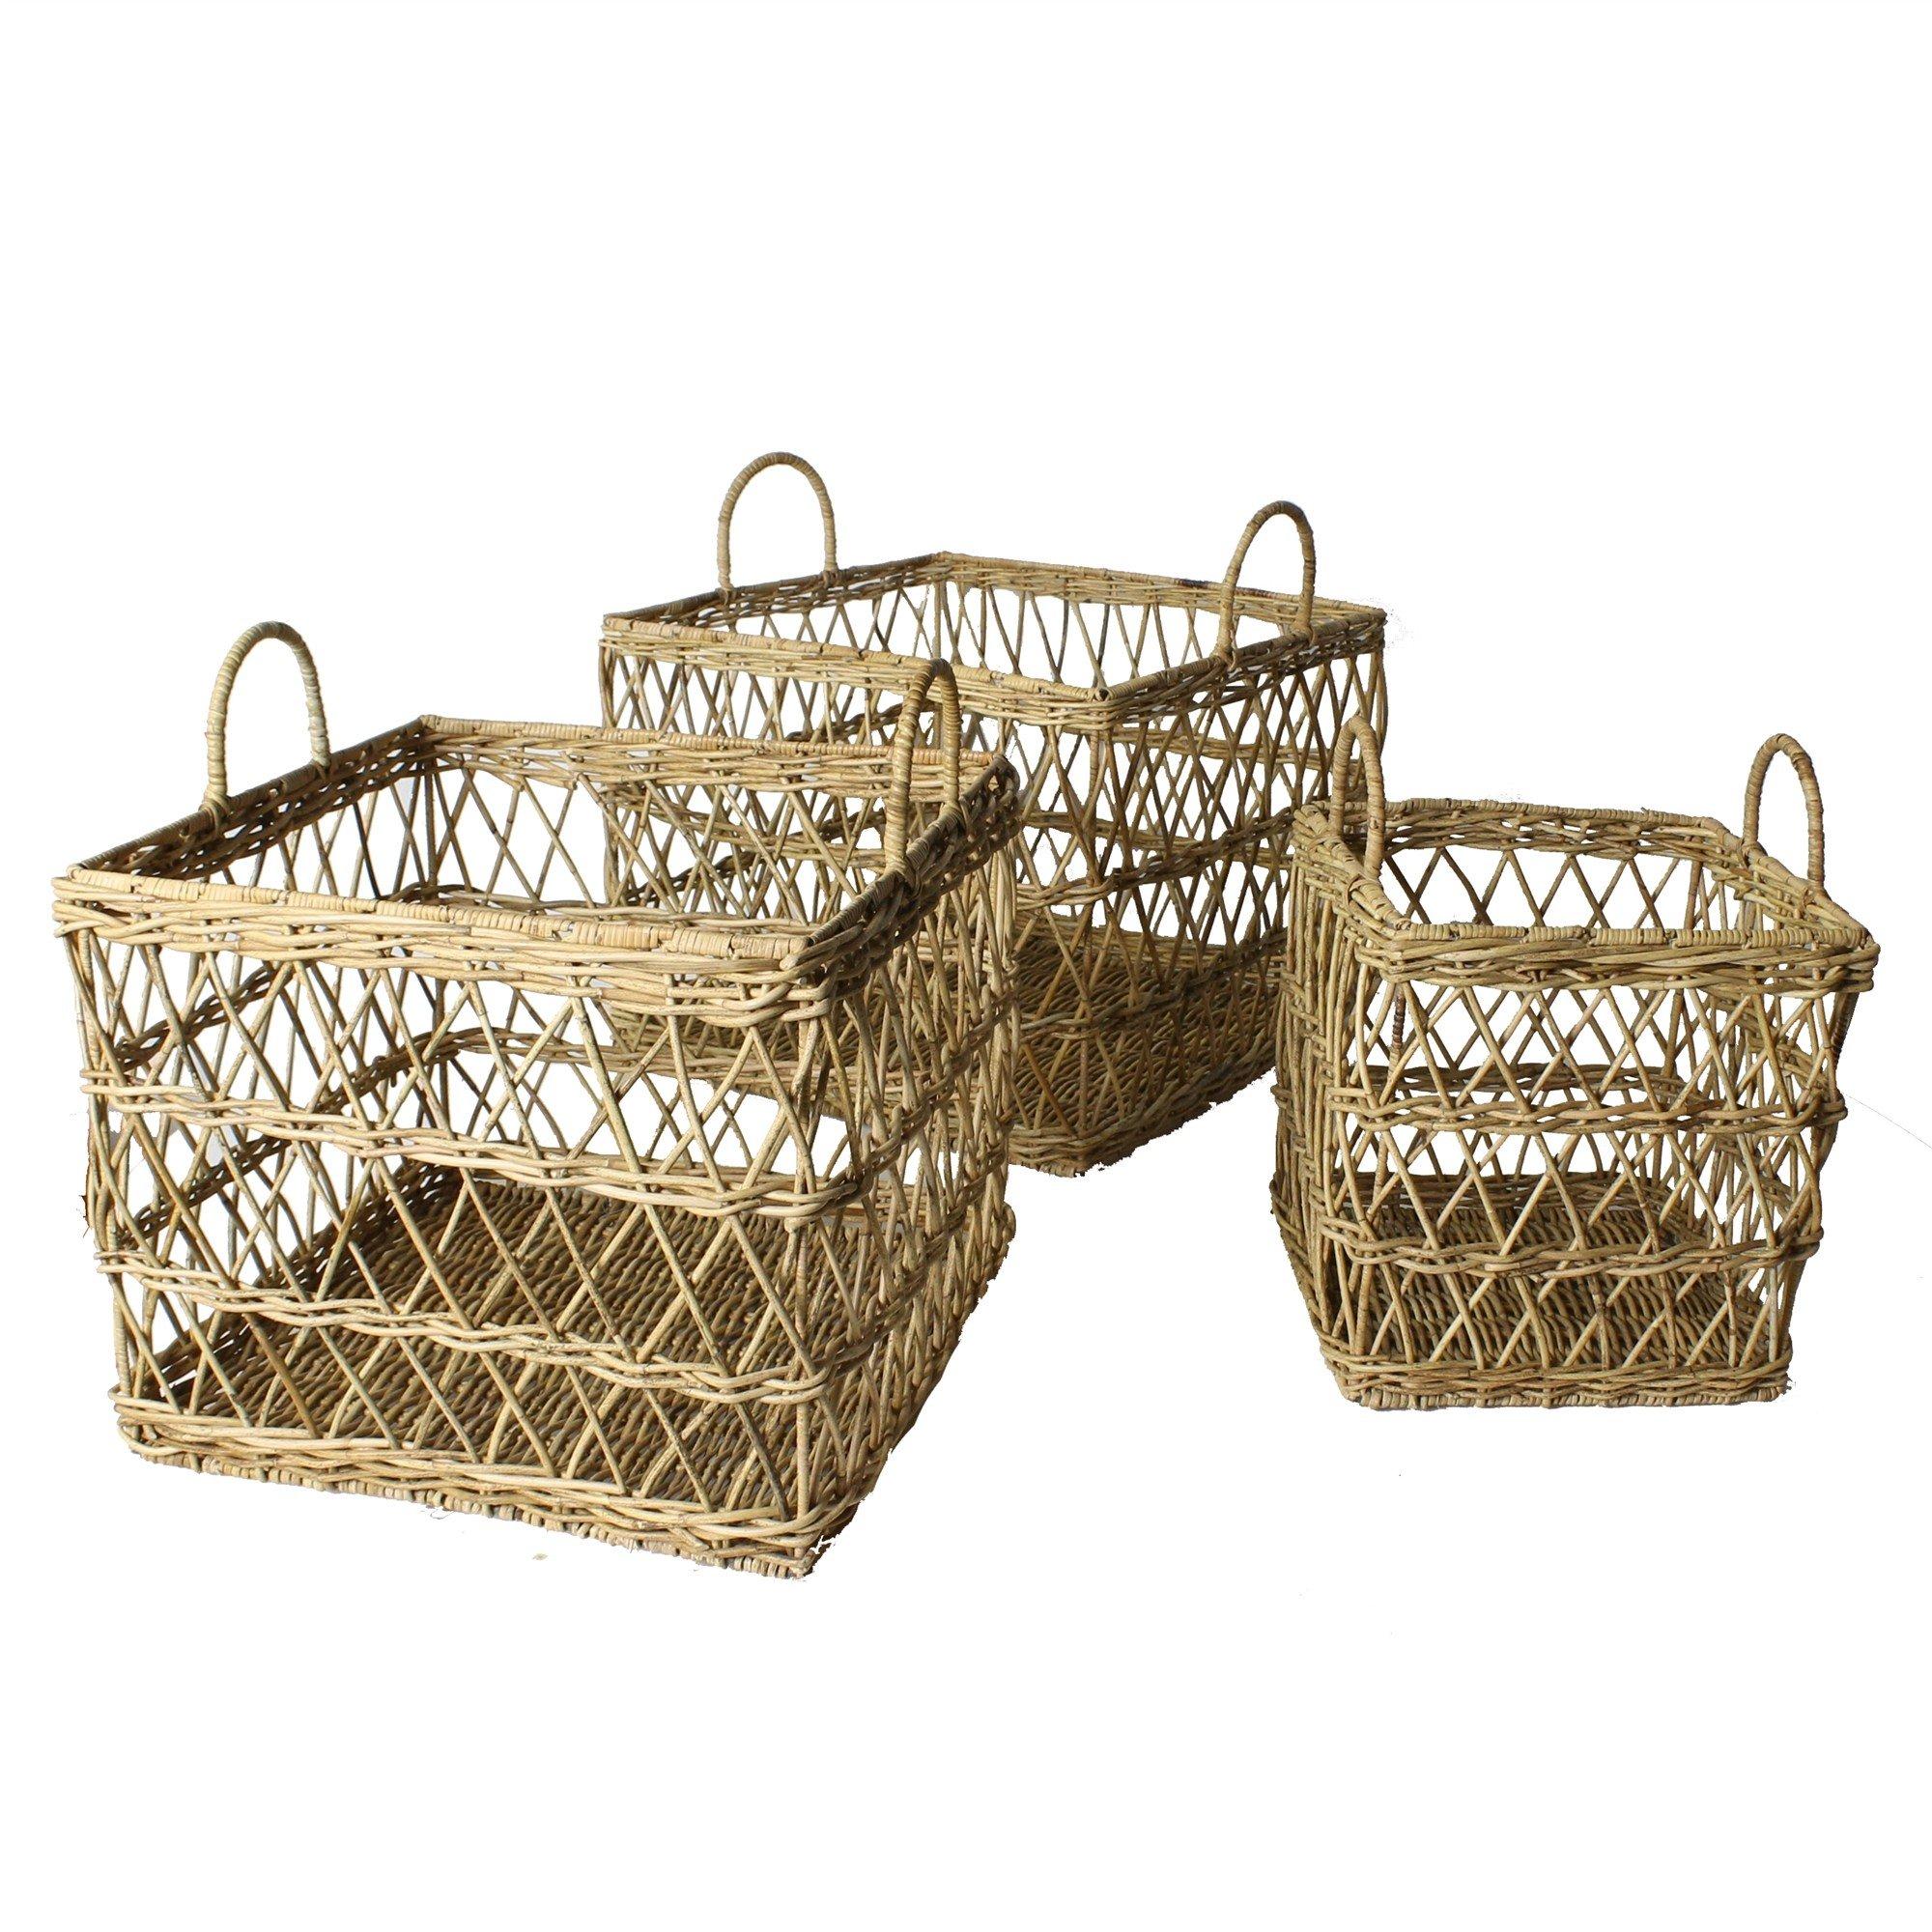 Elegant Lattice Rattan Storage Basket Set | 3 pc Handles Nesting